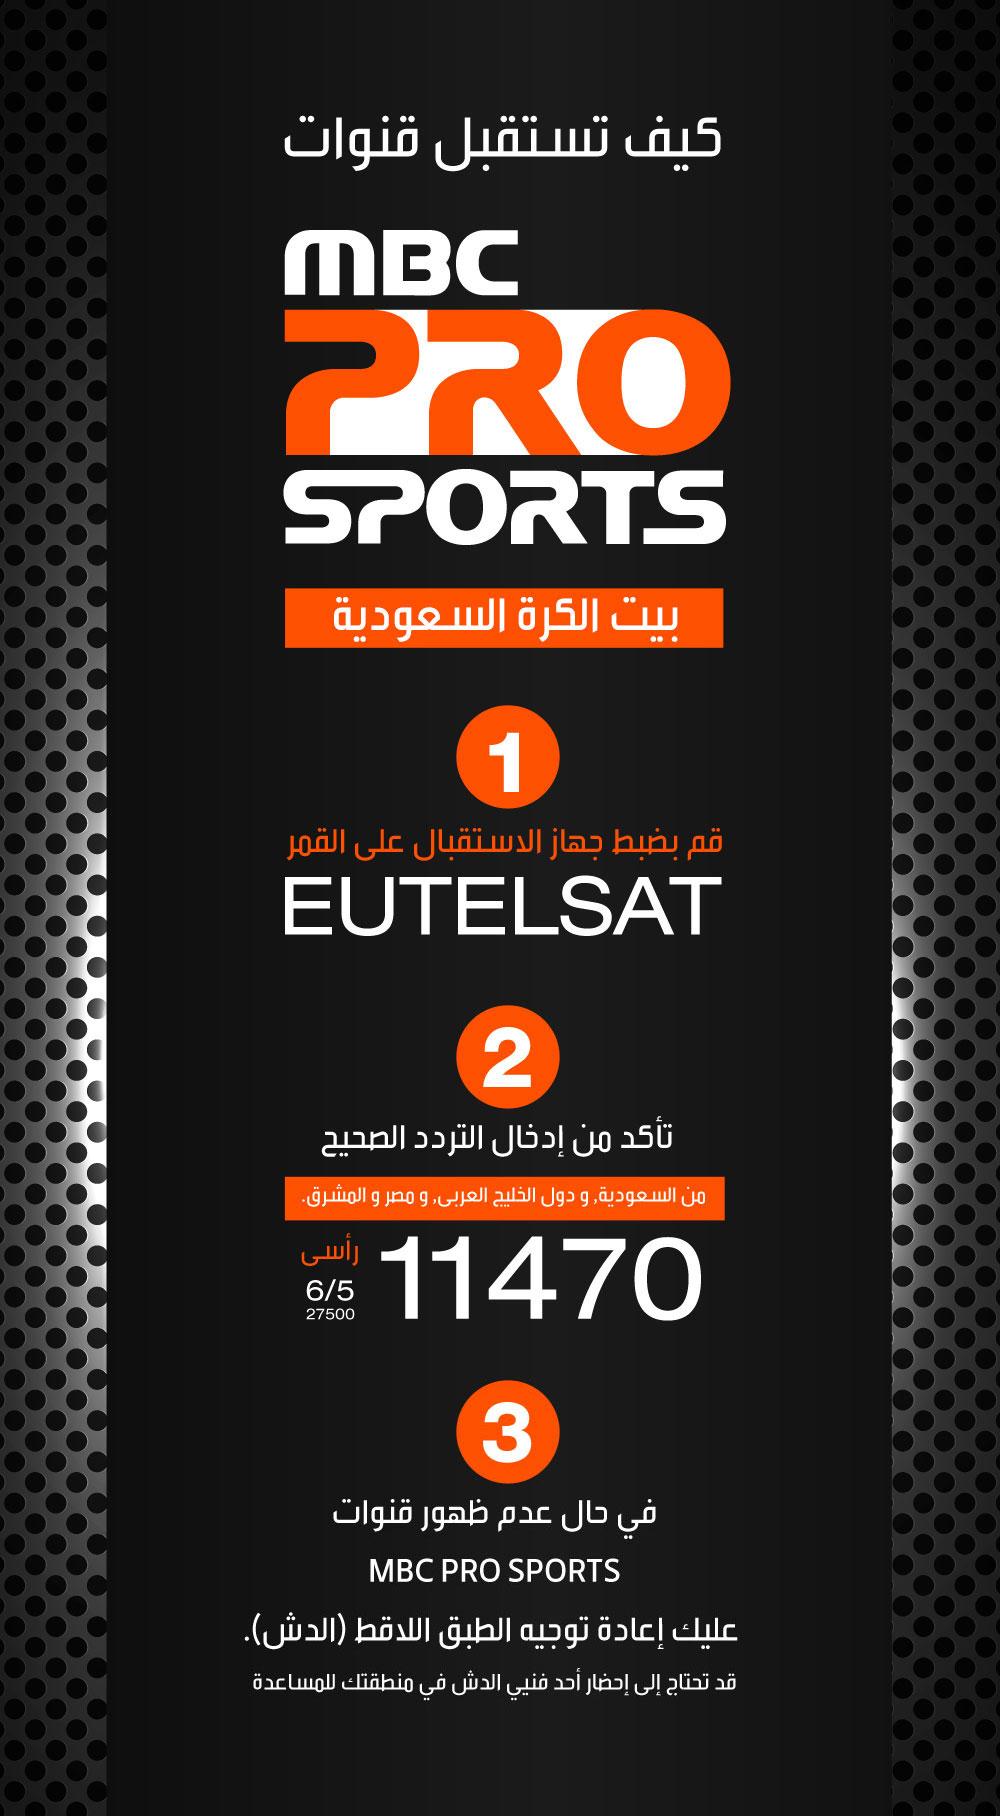 ���� ���� ����� �������� sport prosports-21-12-2015